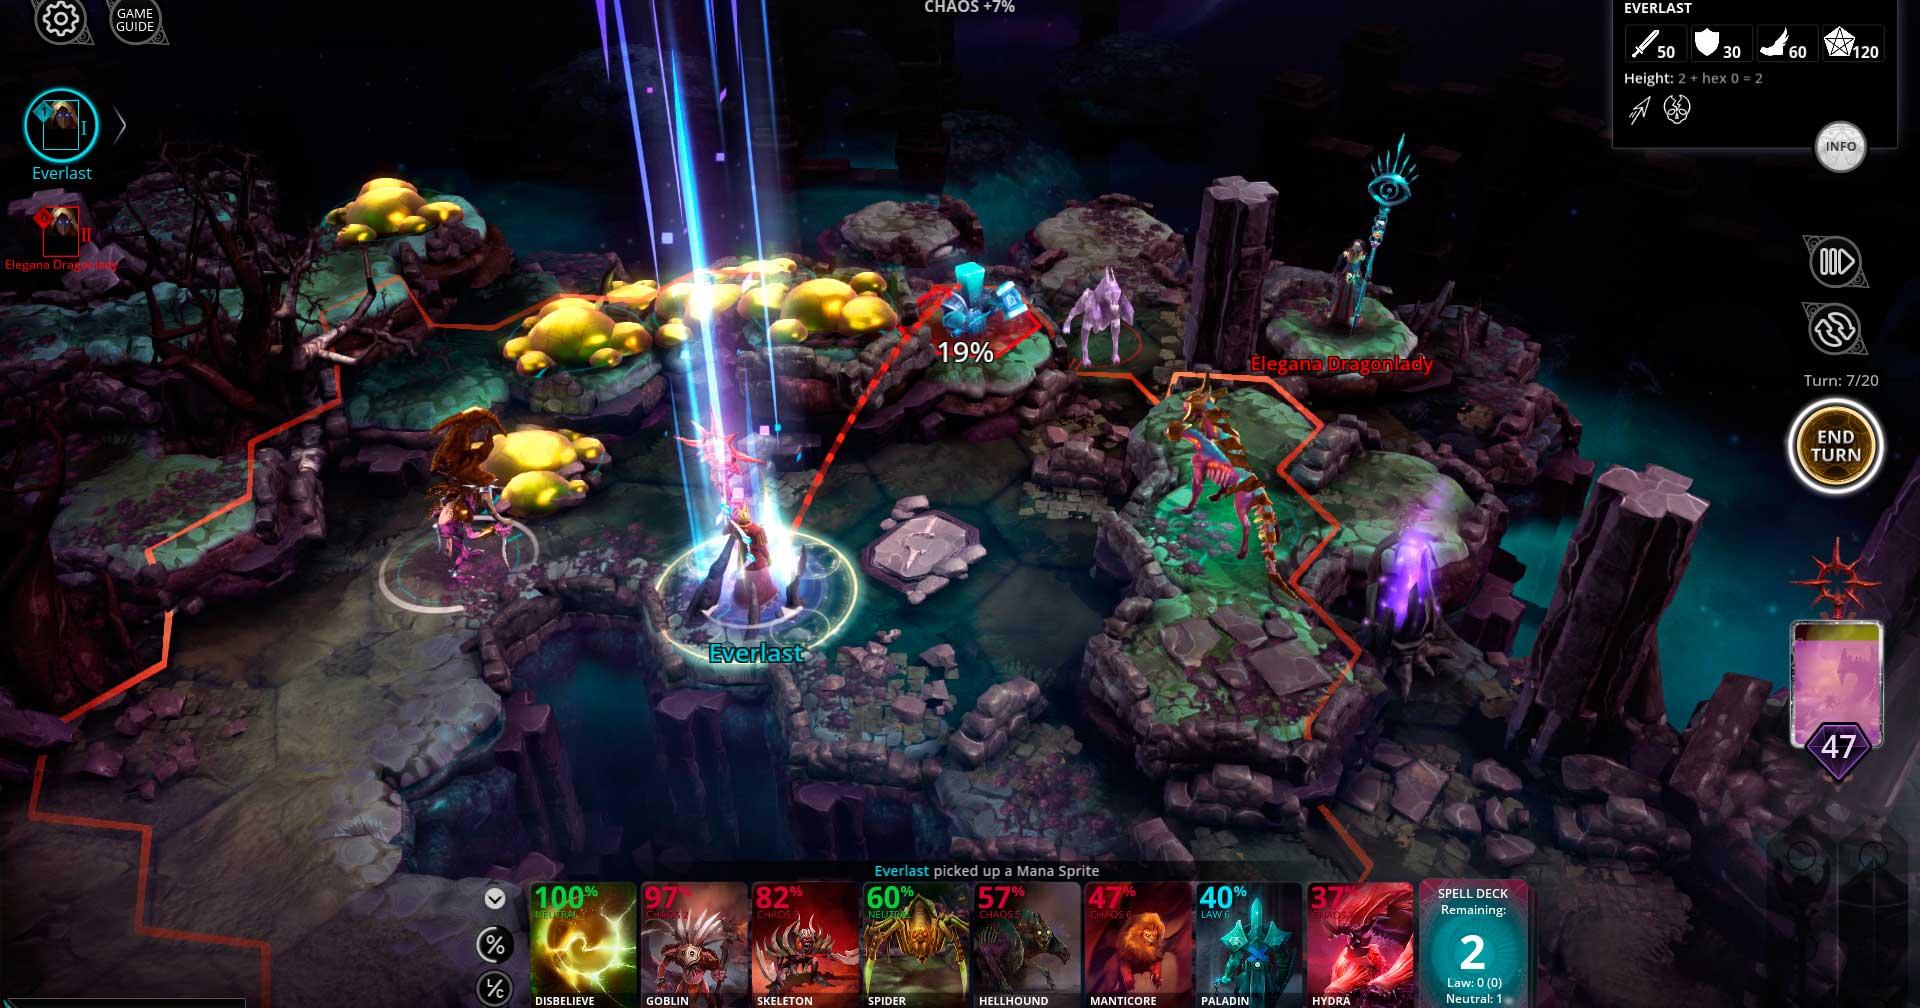 Скриншот к игре Chaos Reborn